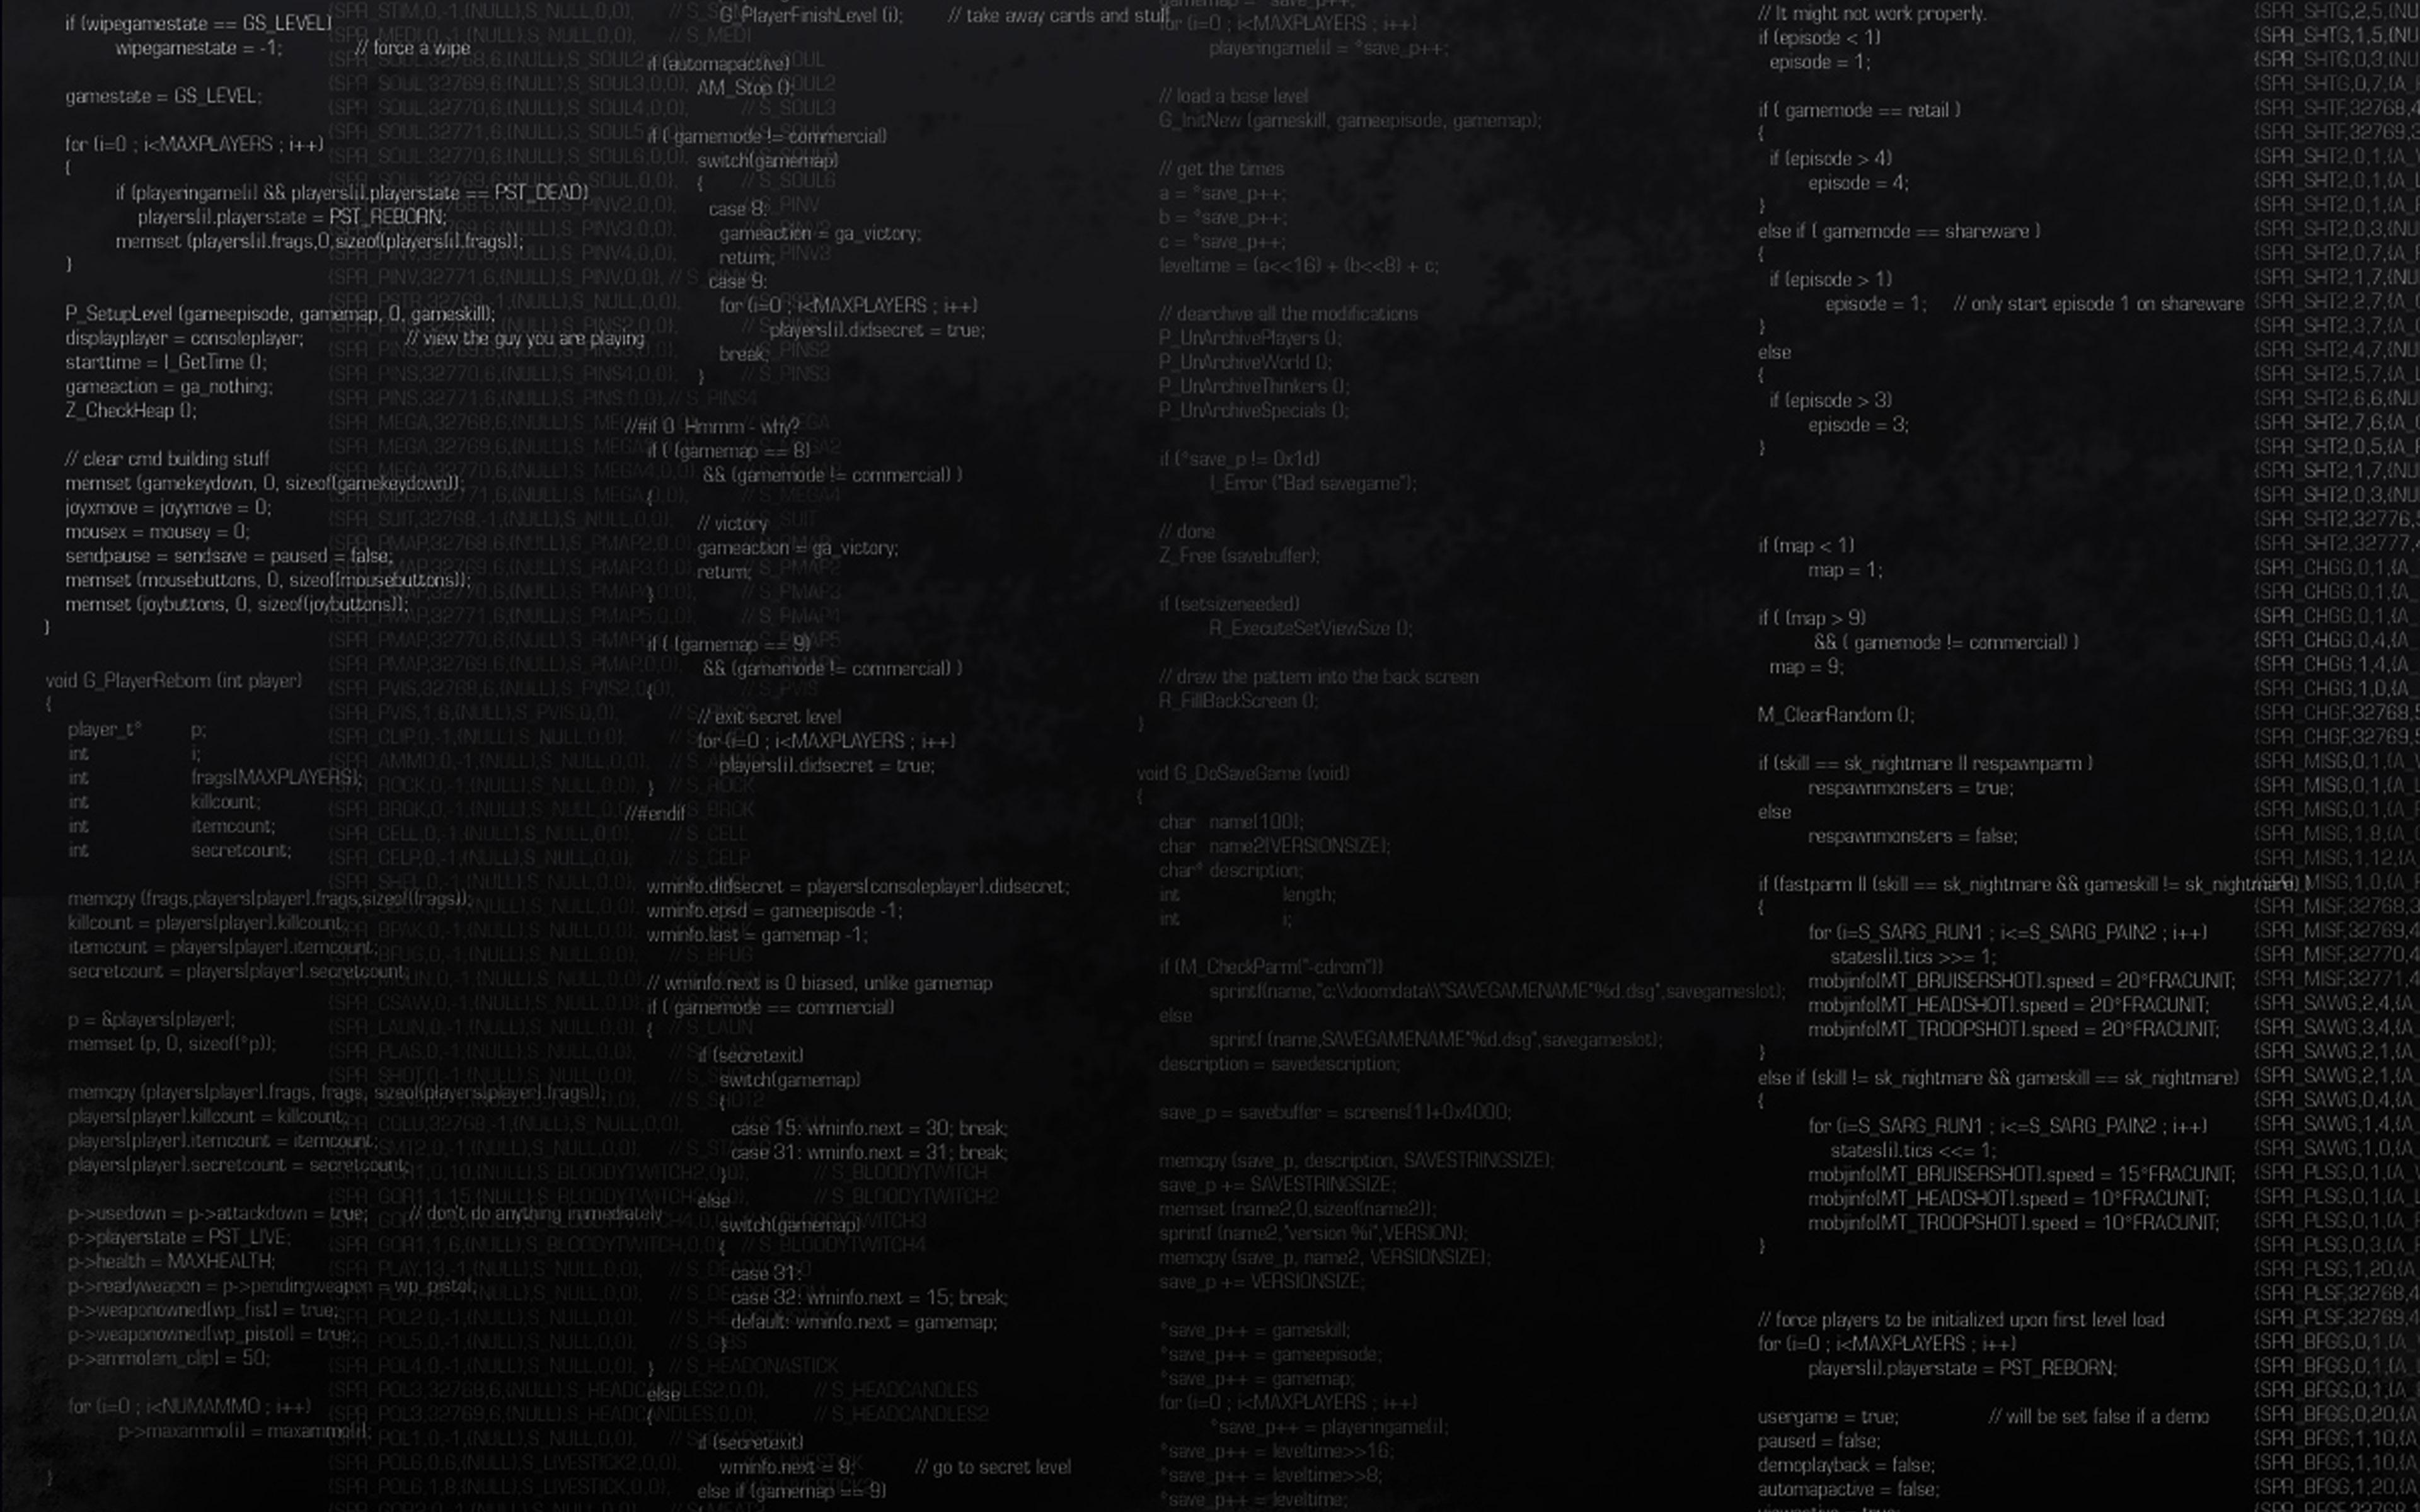 programming wallpaper iphone 6 best hd wallpaper